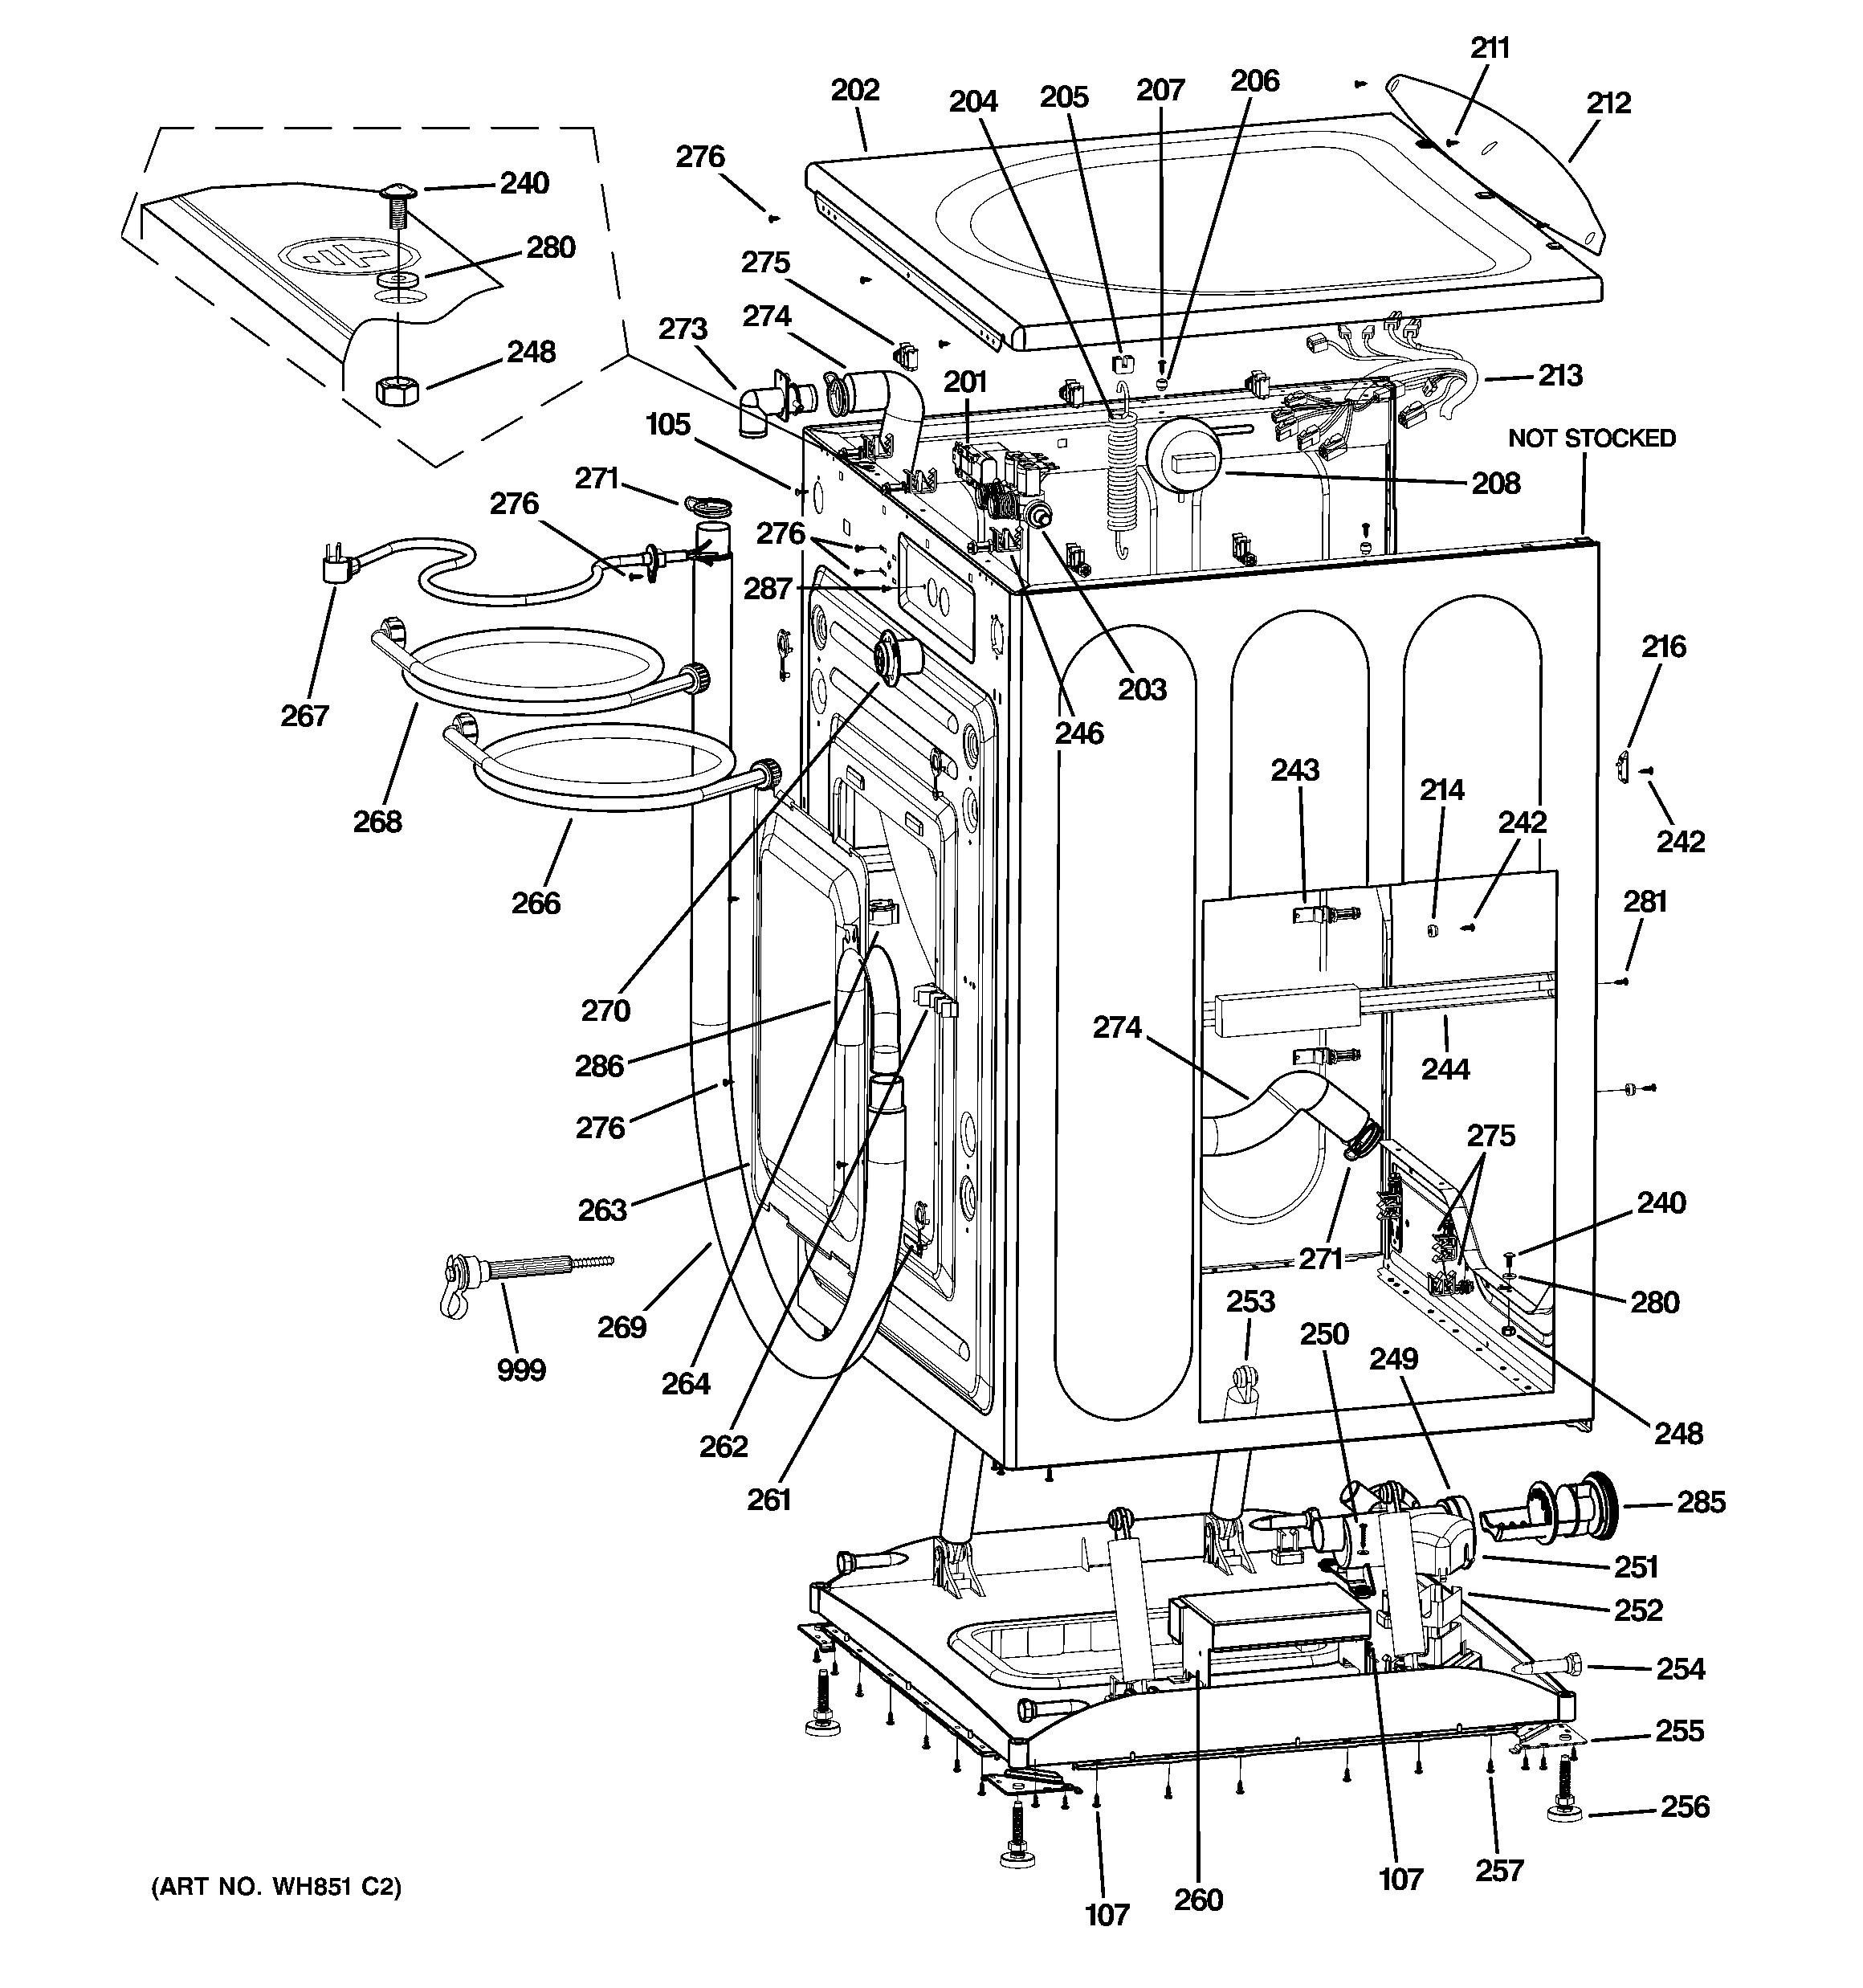 Ge Quiet Power 3 Parts Diagram Ge Model Wcvh6400j0ww Residential Washers Genuine Parts Of Ge Quiet Power 3 Parts Diagram